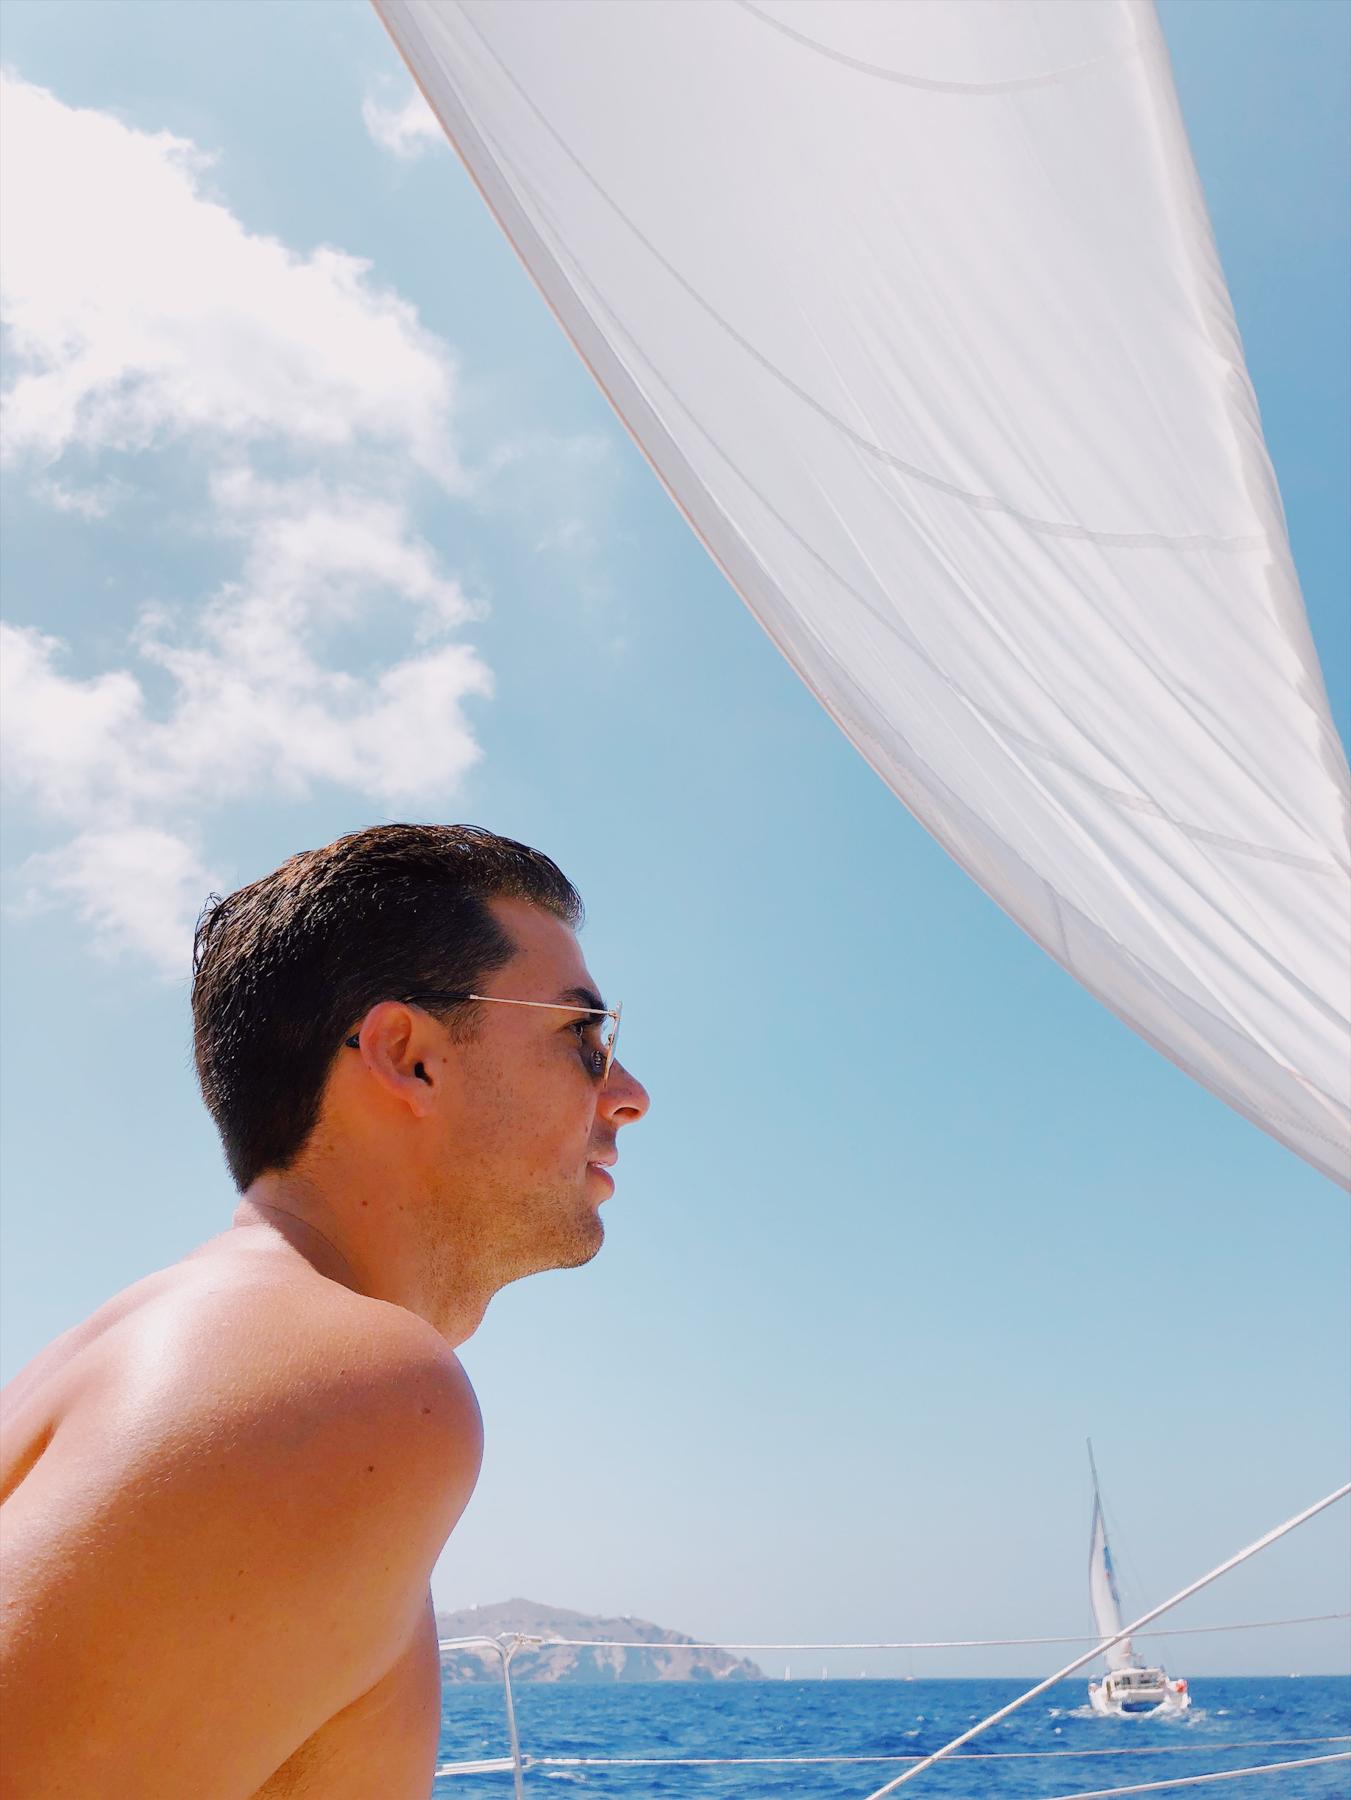 Cruising around on the boat